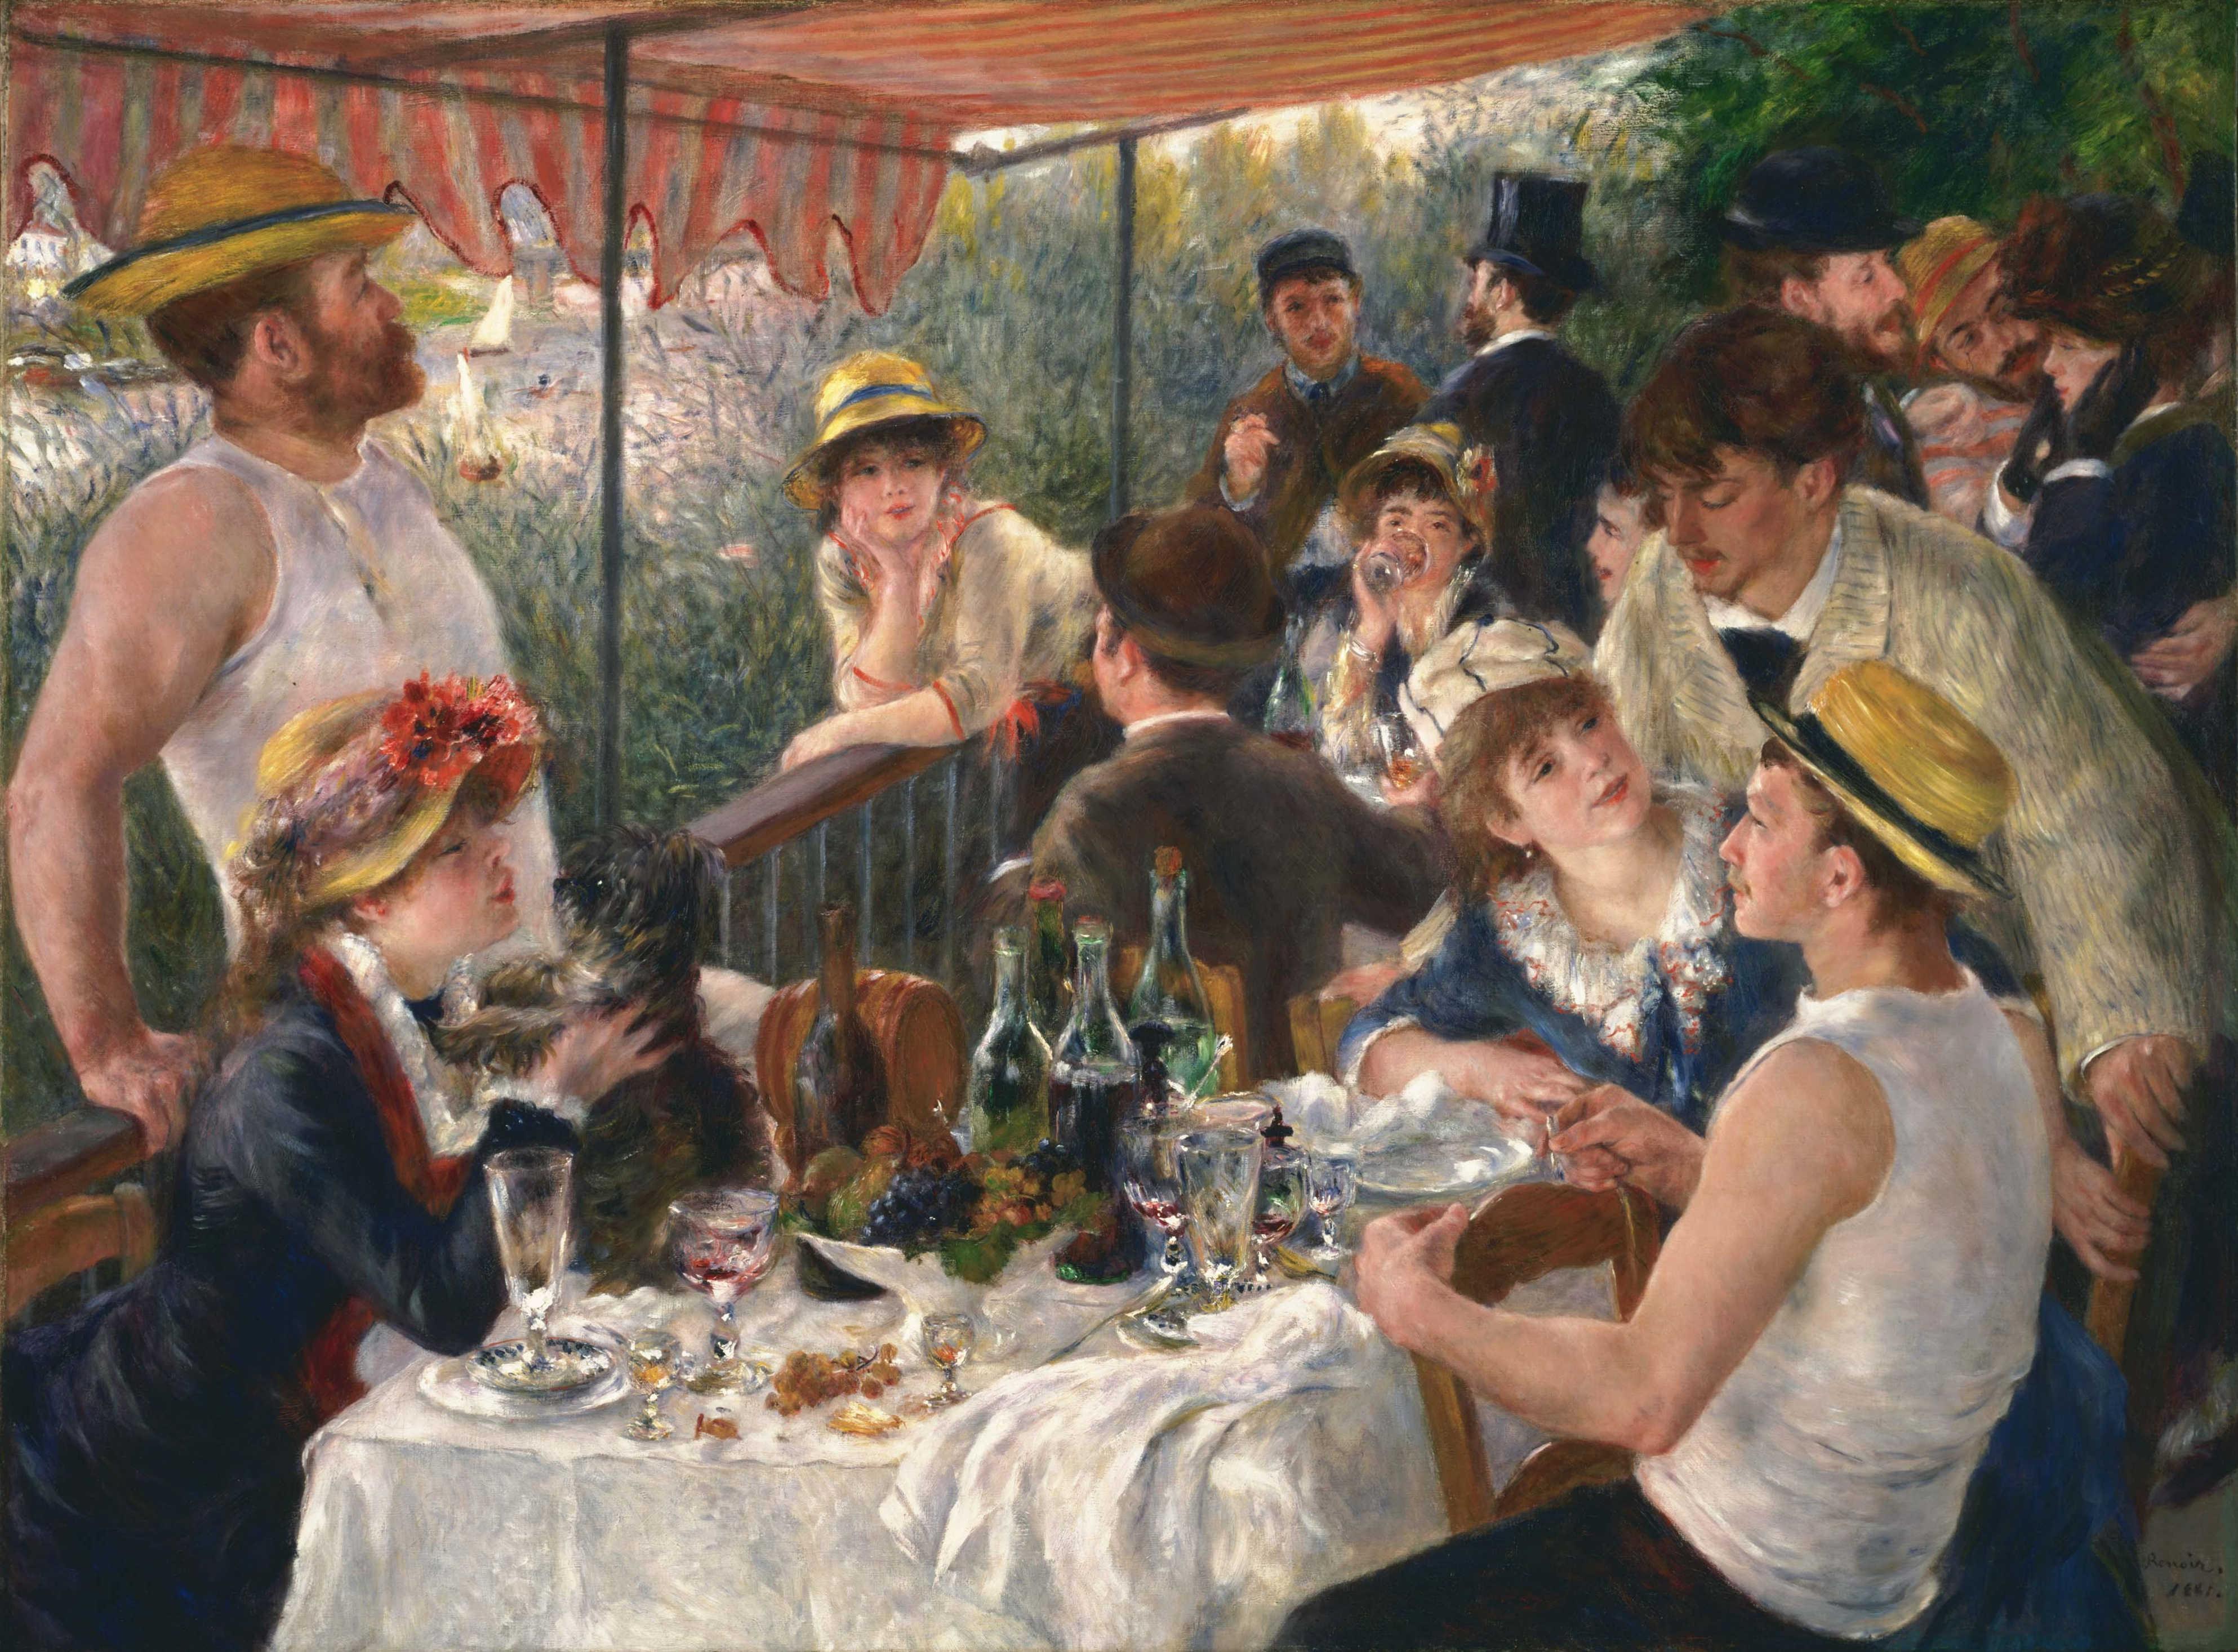 Pierre-Auguste Renoir - Lunch van de roeiers - 1881